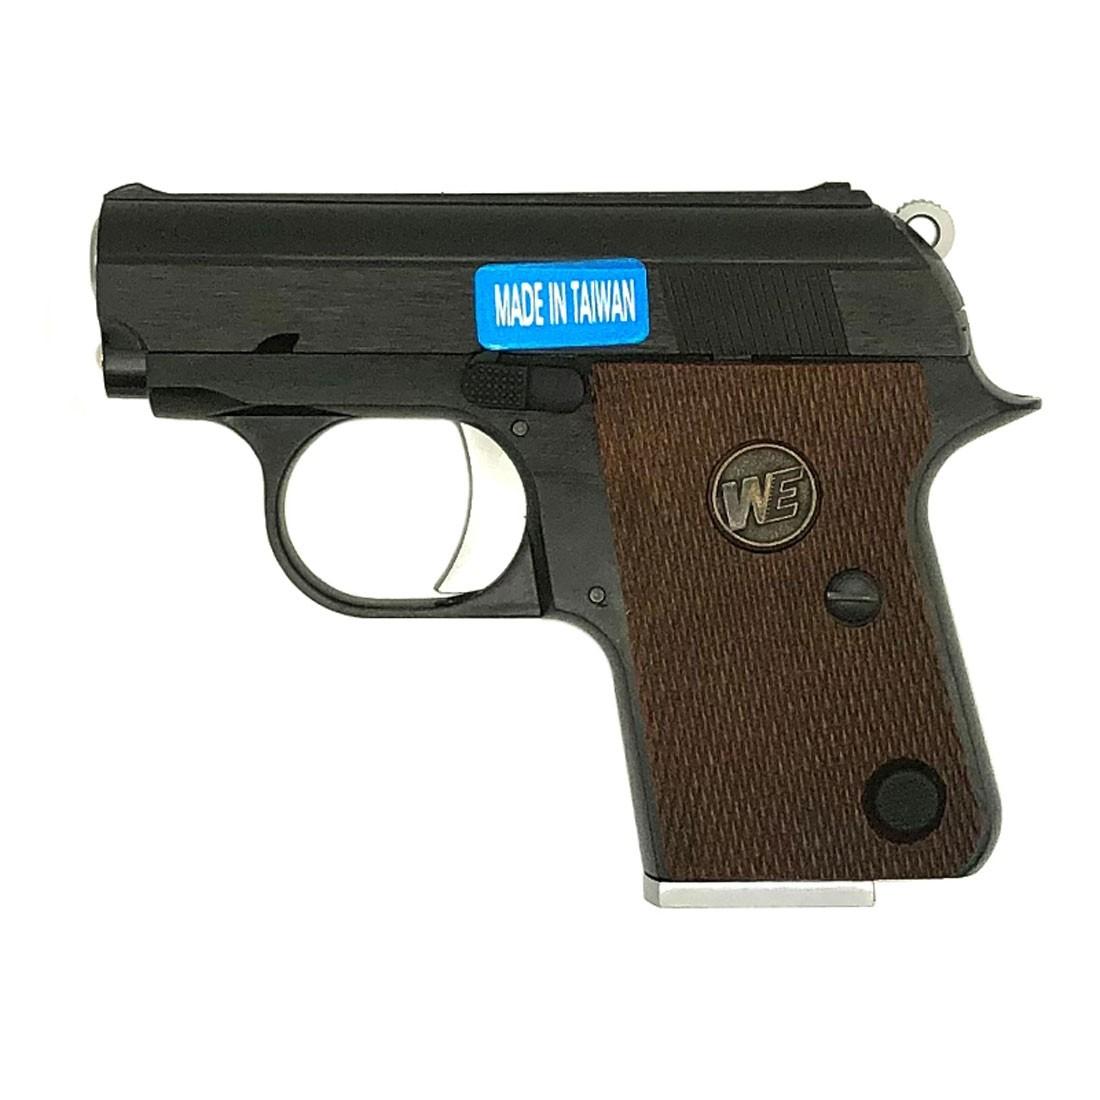 WE Colt 25 Auto CT25 Full Metal Gas Blowback Airsoft Pistol - Black